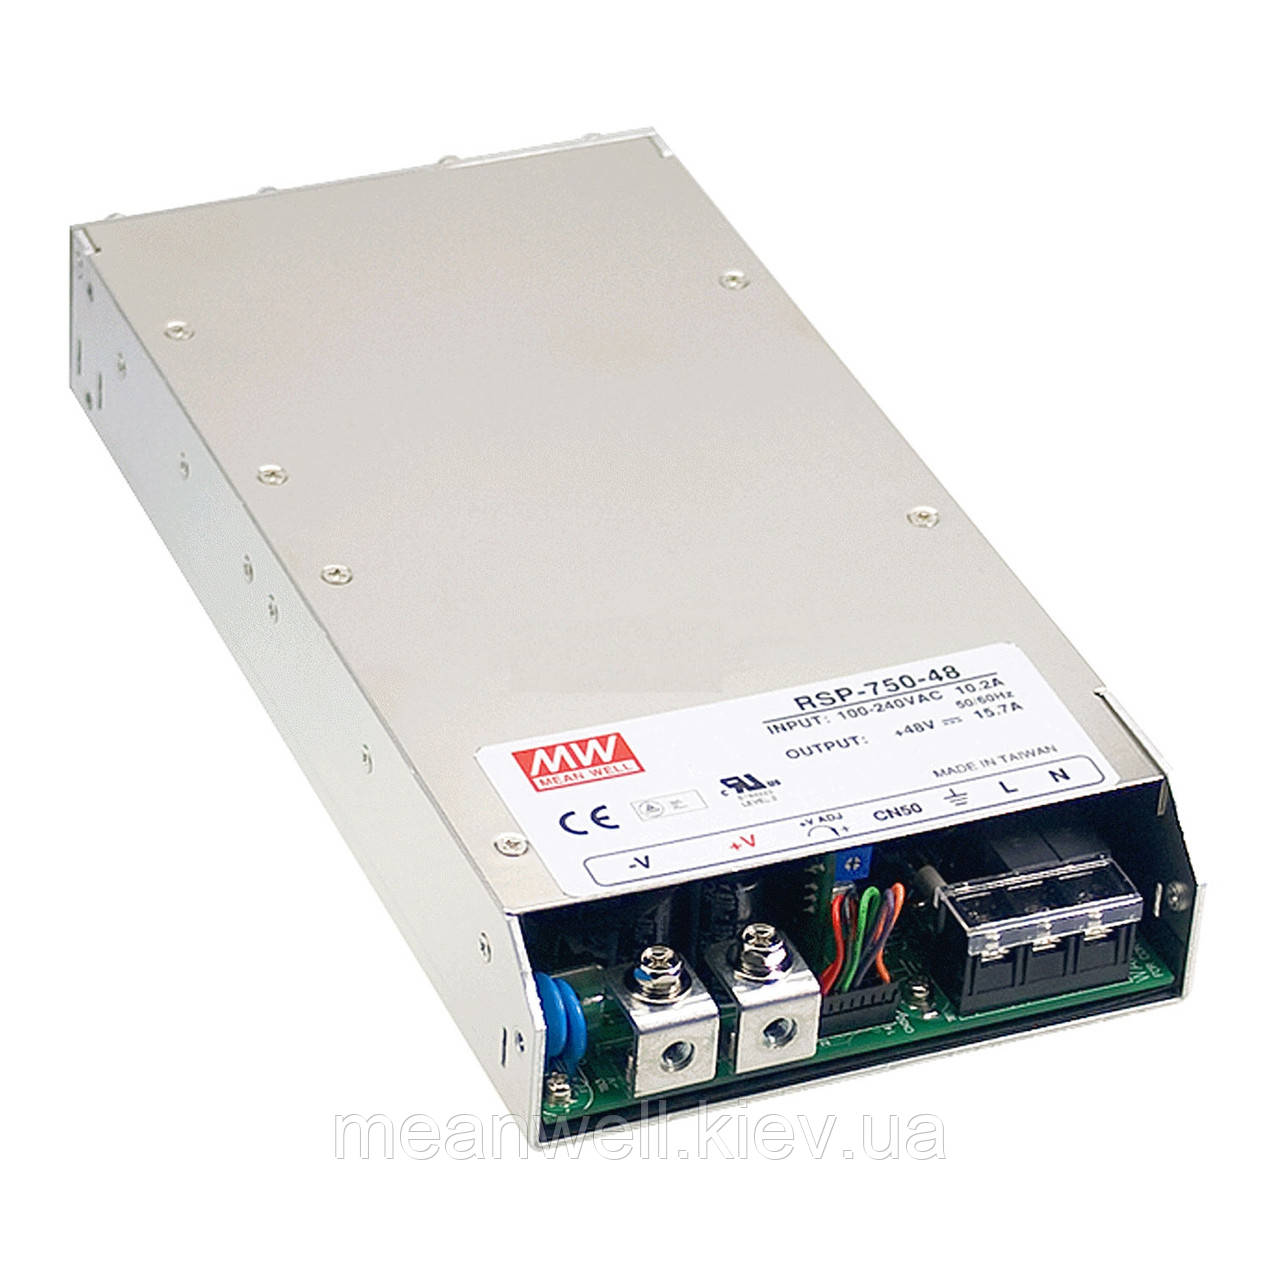 RSP-750-12 Блок питания Mean well 750 вт, 62,5А, 12в